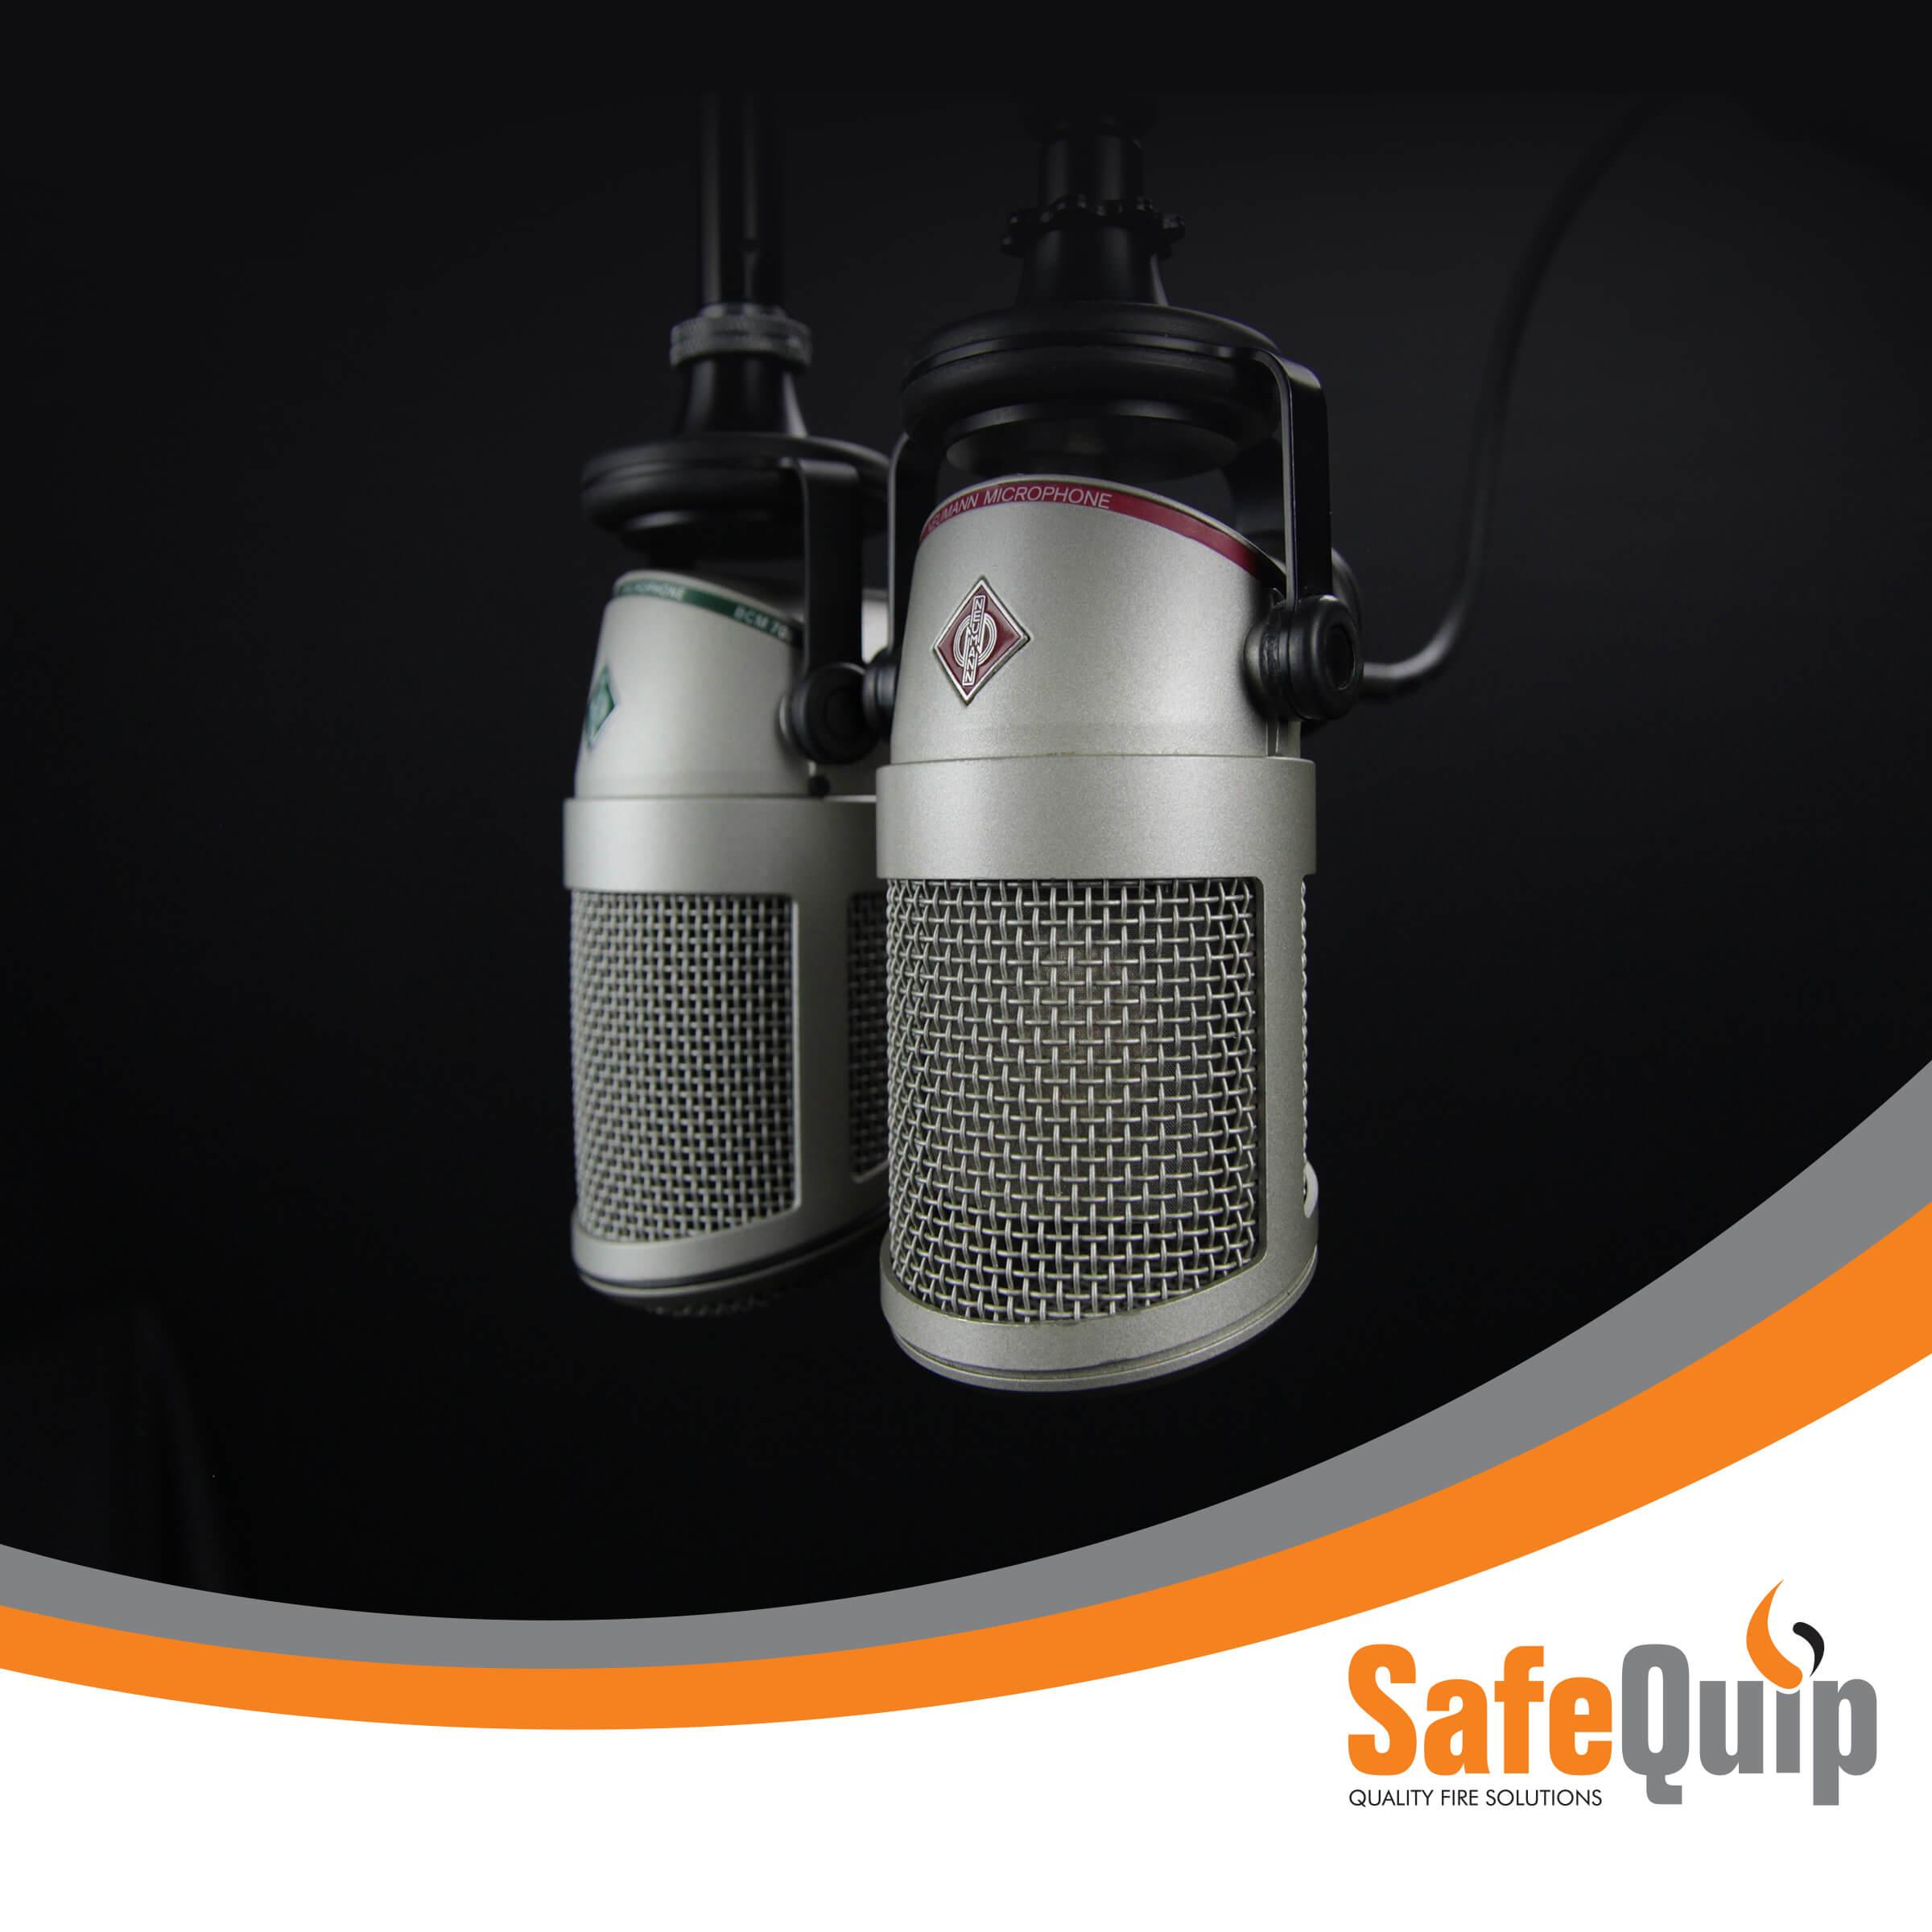 Safequip Pty Ltd